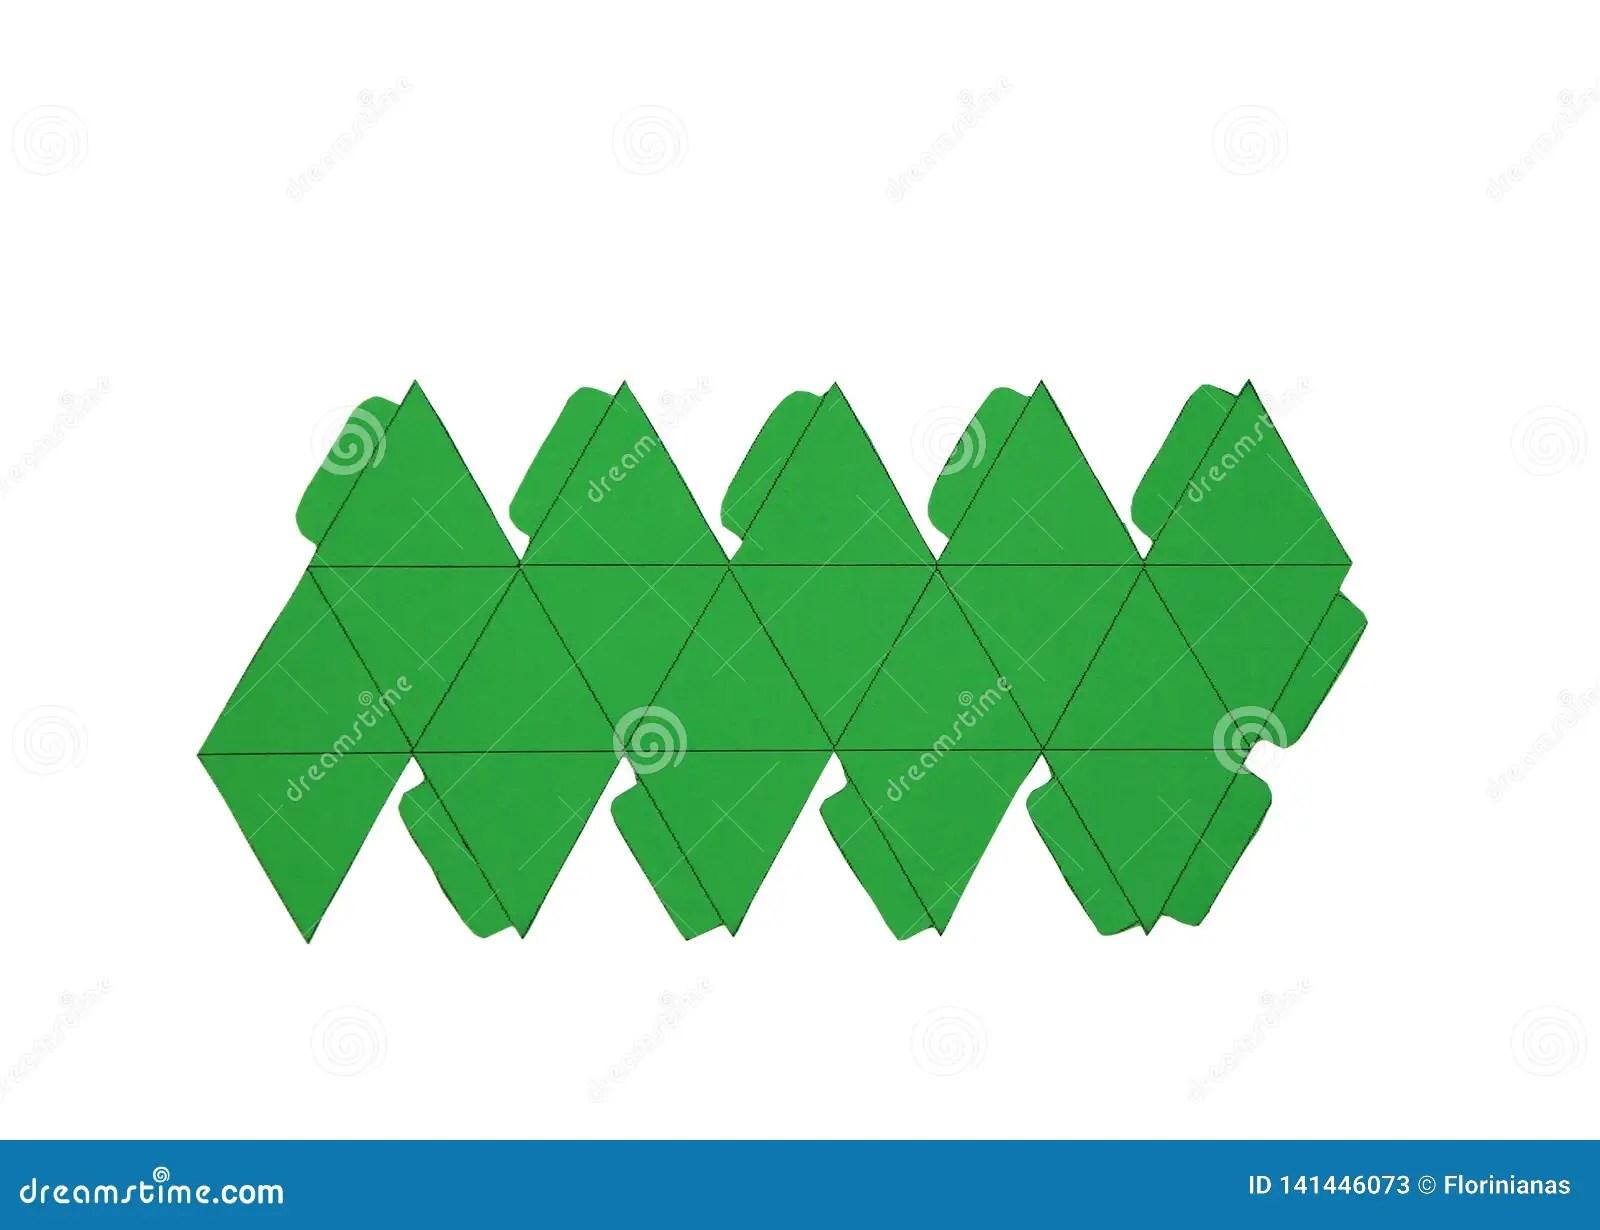 Geometry Net Of Platonic Solids Icosahedron 2 Dimensional